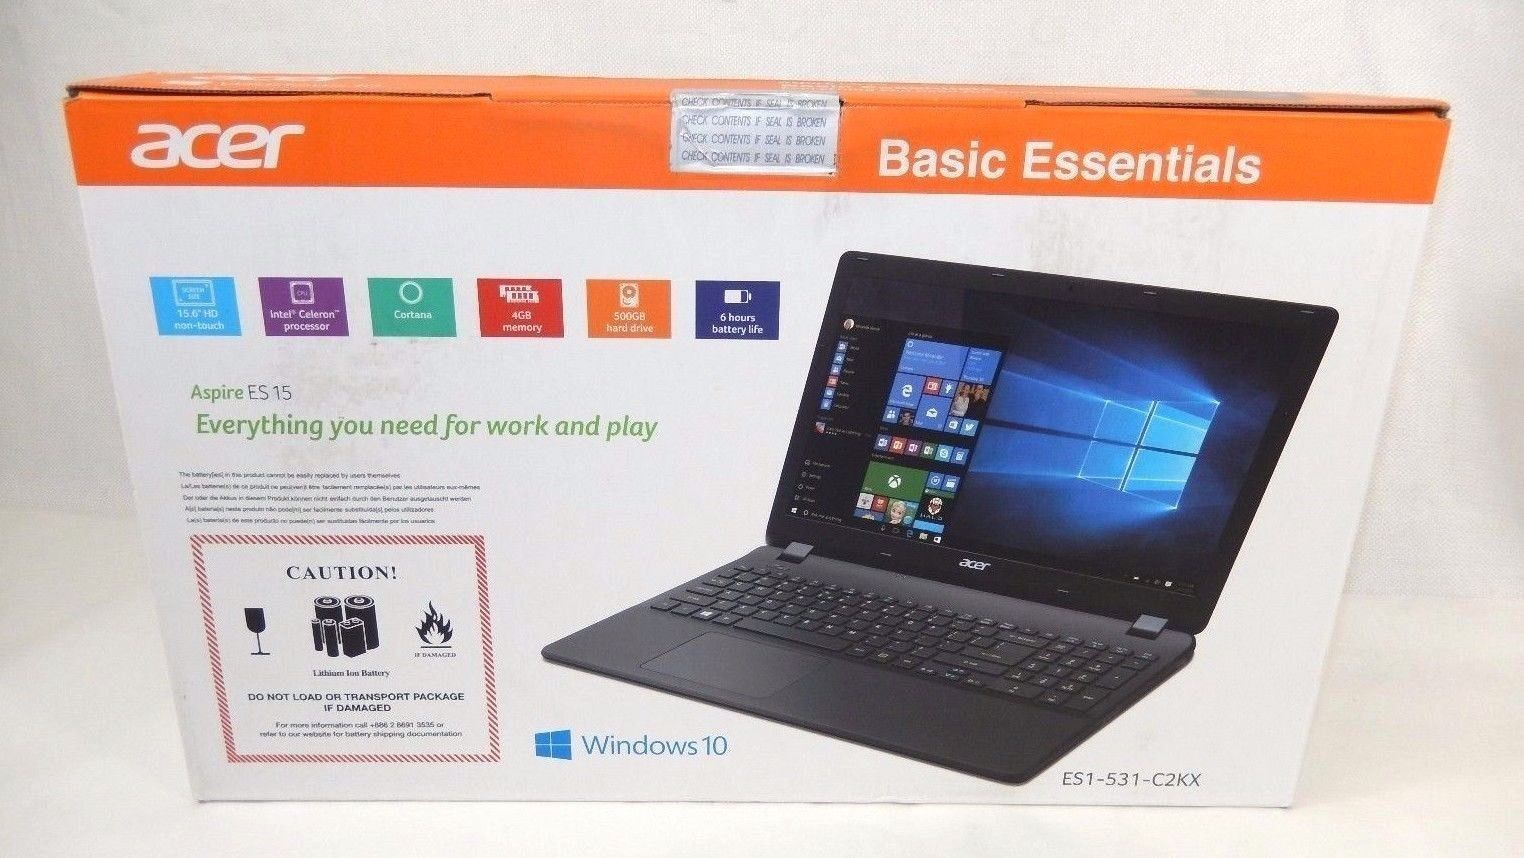 Acer Aspire ES15 Basic Essentials 4GB Ram 500GB Hard drive ES1-531-C2KX FREE S/H